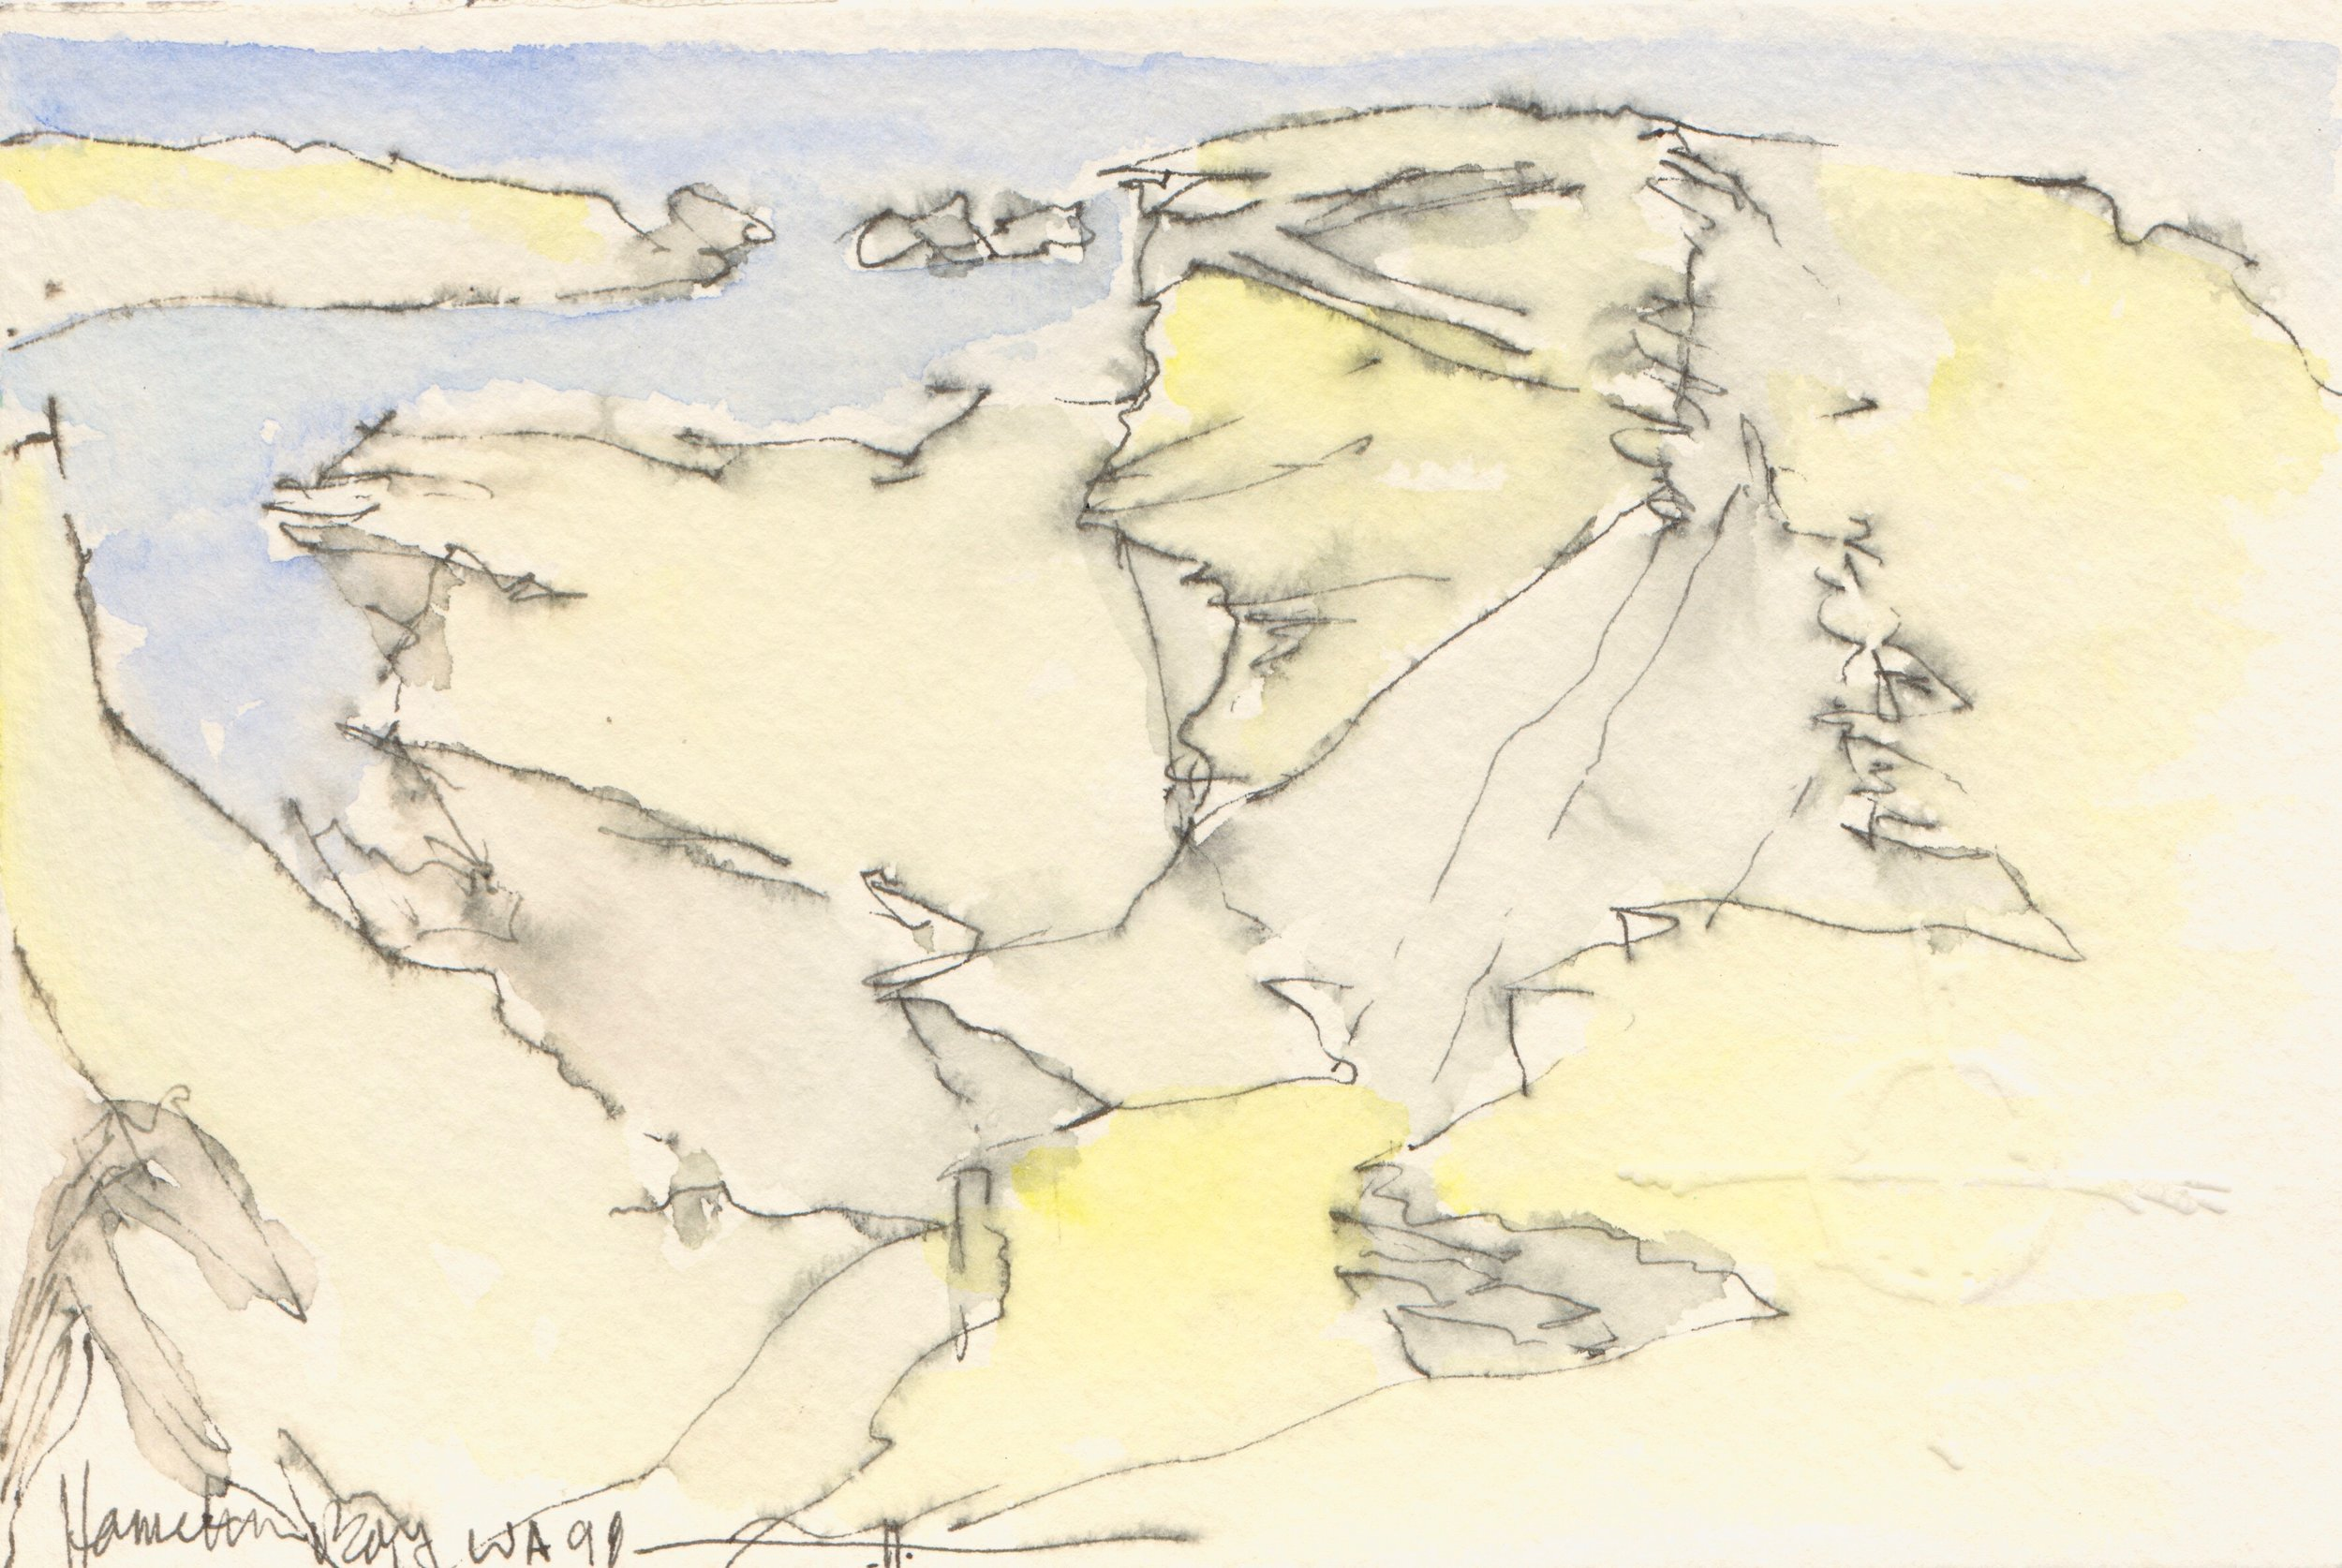 Hamelin Bay 4, W.A. 98-181211-0008.jpg